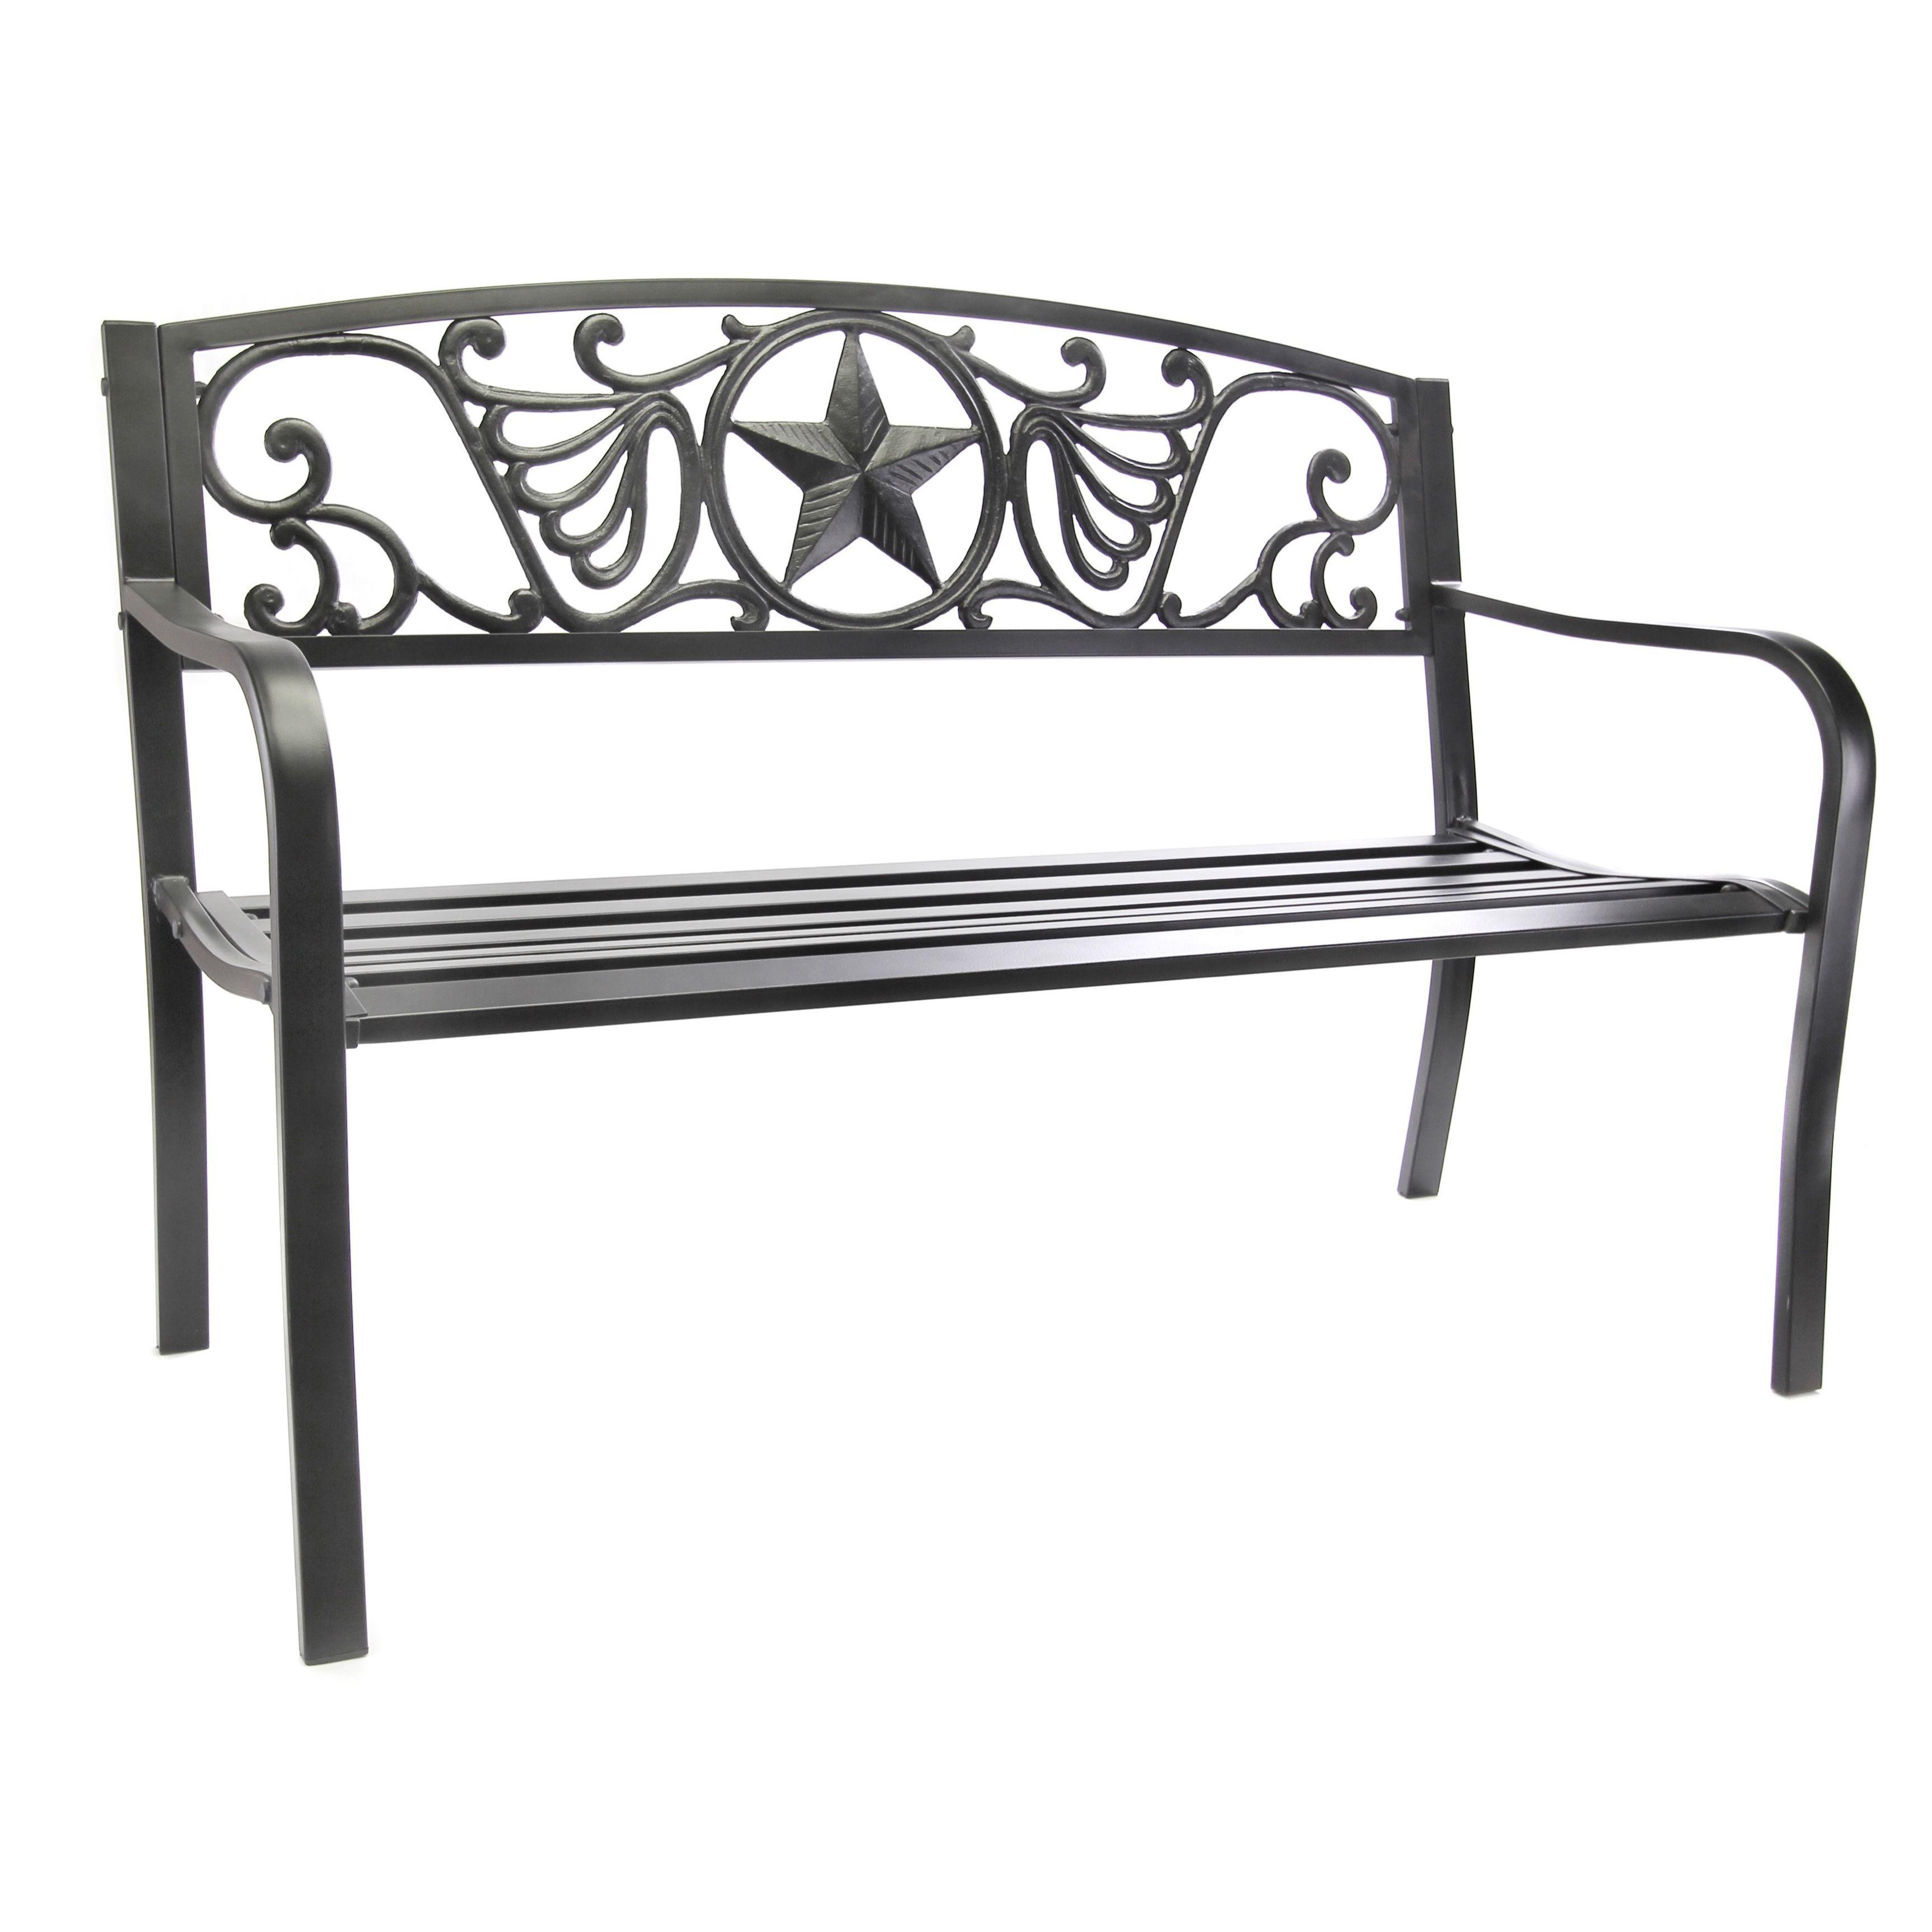 Jordan Manufacturing Lonestar Outdoor Bench (Black Lonestar Bench), Patio  Furniture (Steel)